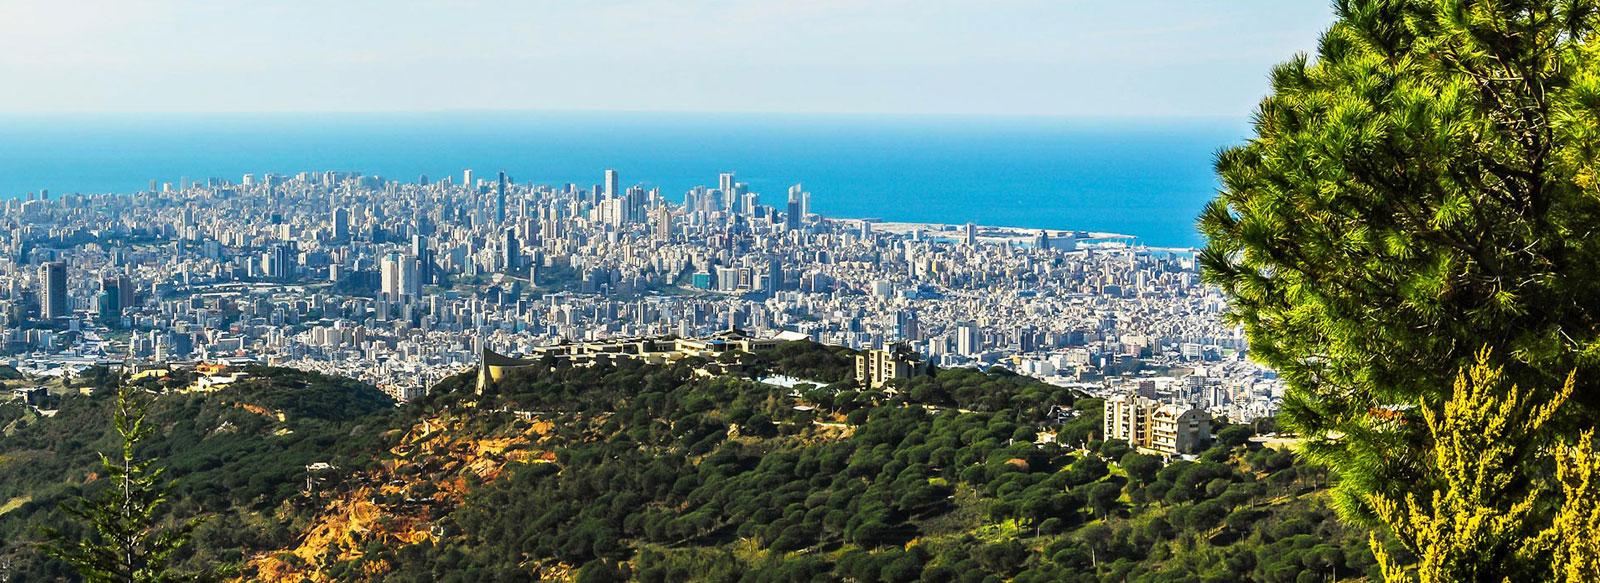 Upcoming Development Featuring Land Plots